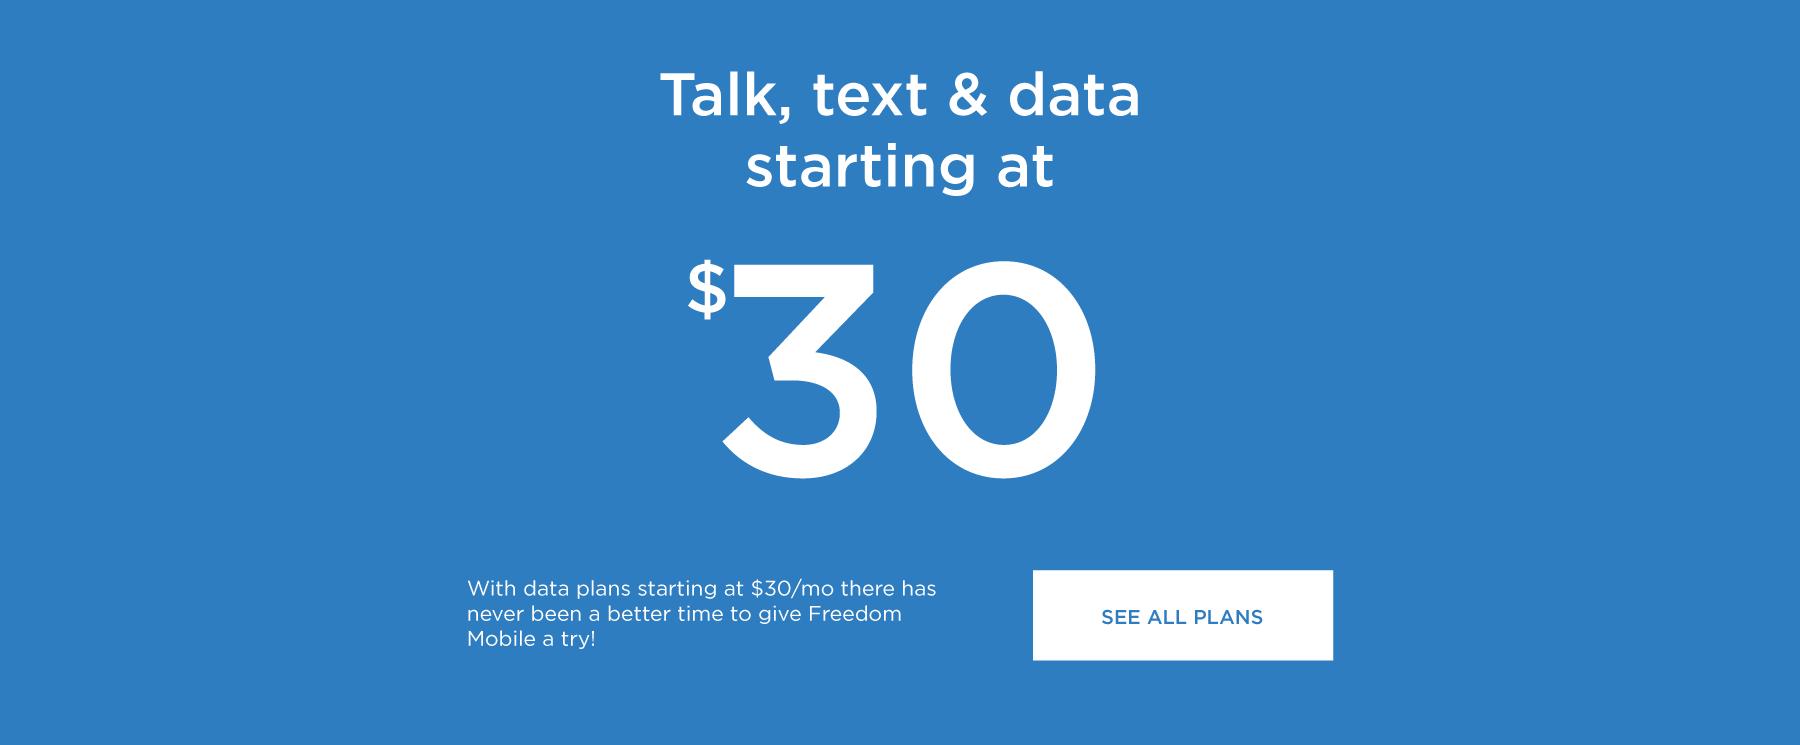 Talk, text & data starting at $30